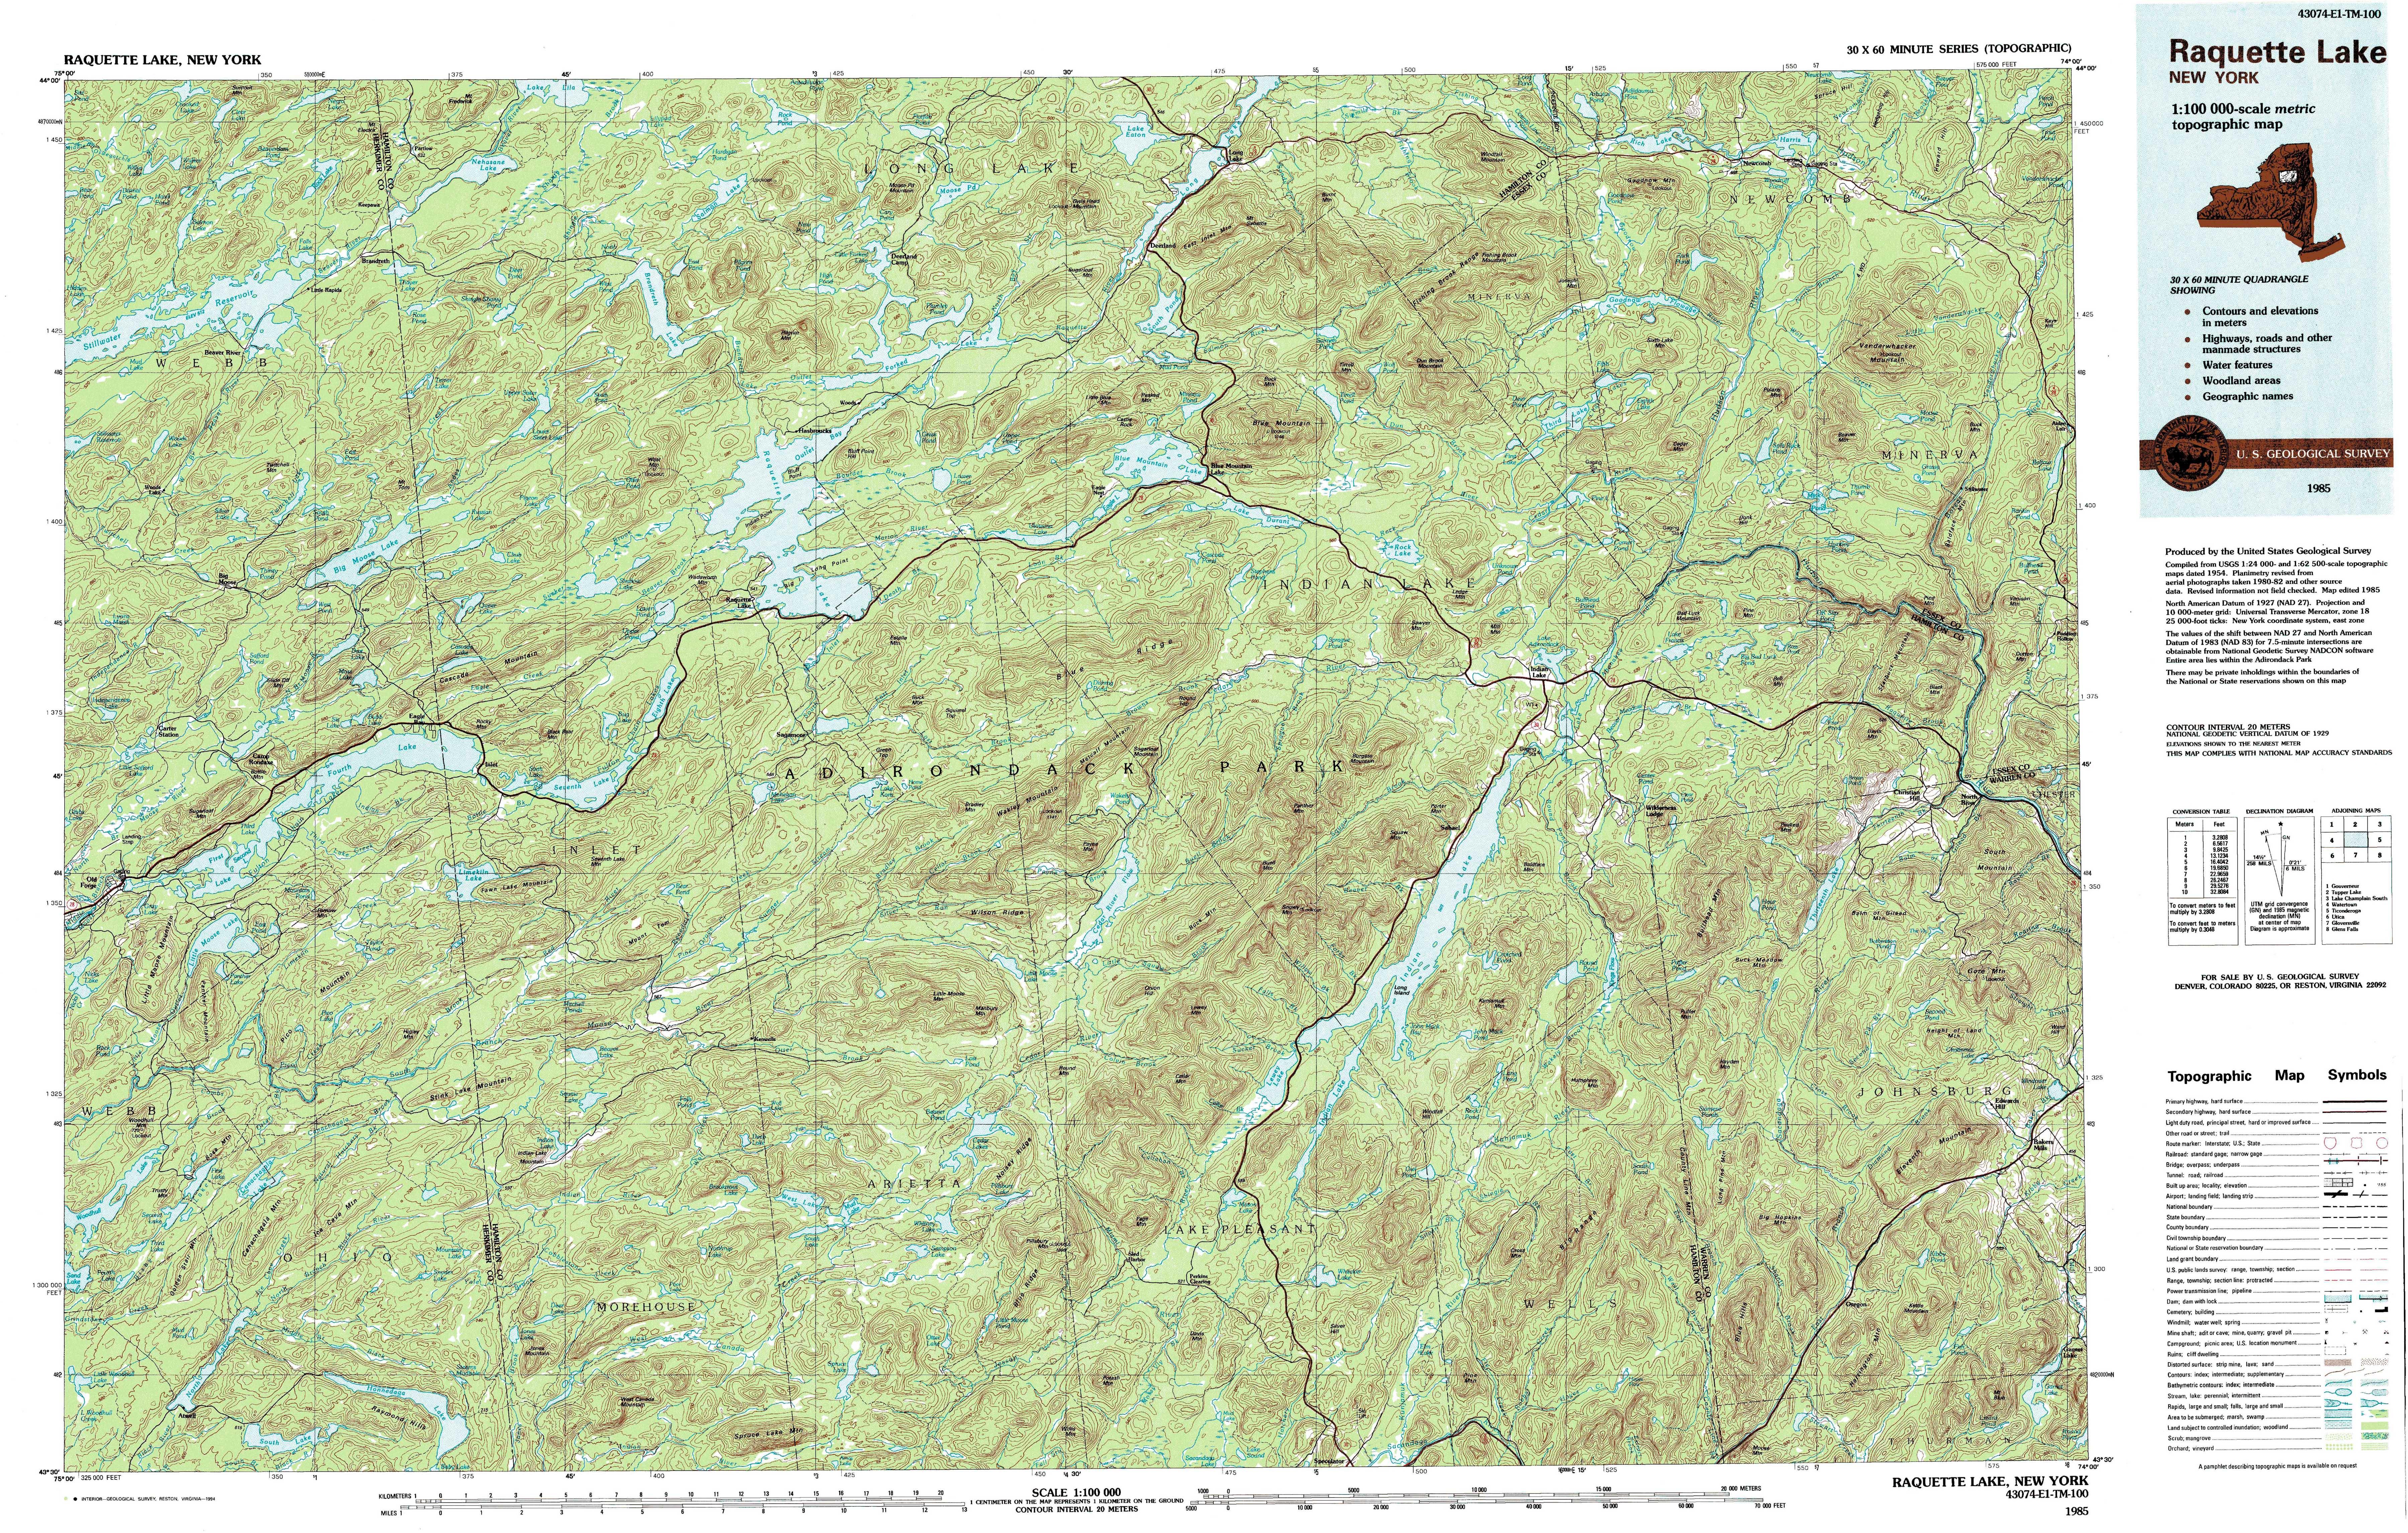 New York Topo Maps Topographic Maps - Usgs topo quad maps